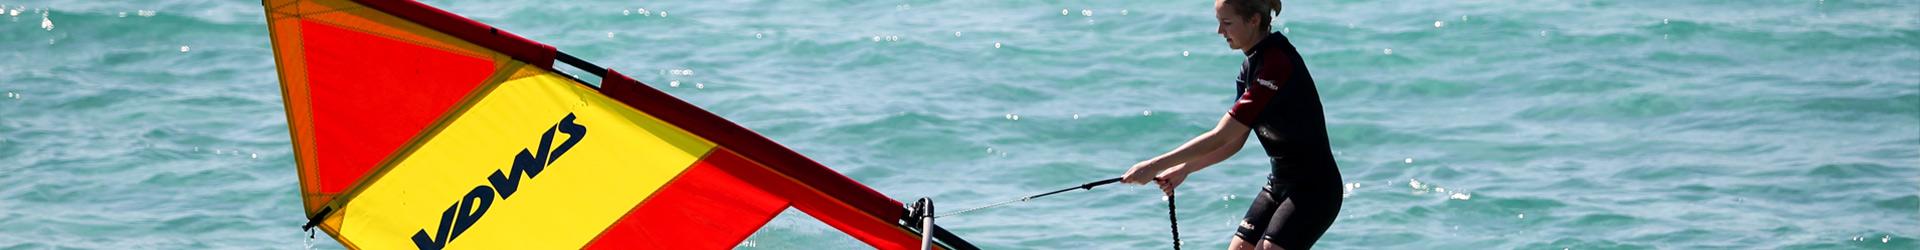 1920×250-windsurfen-djerba-1